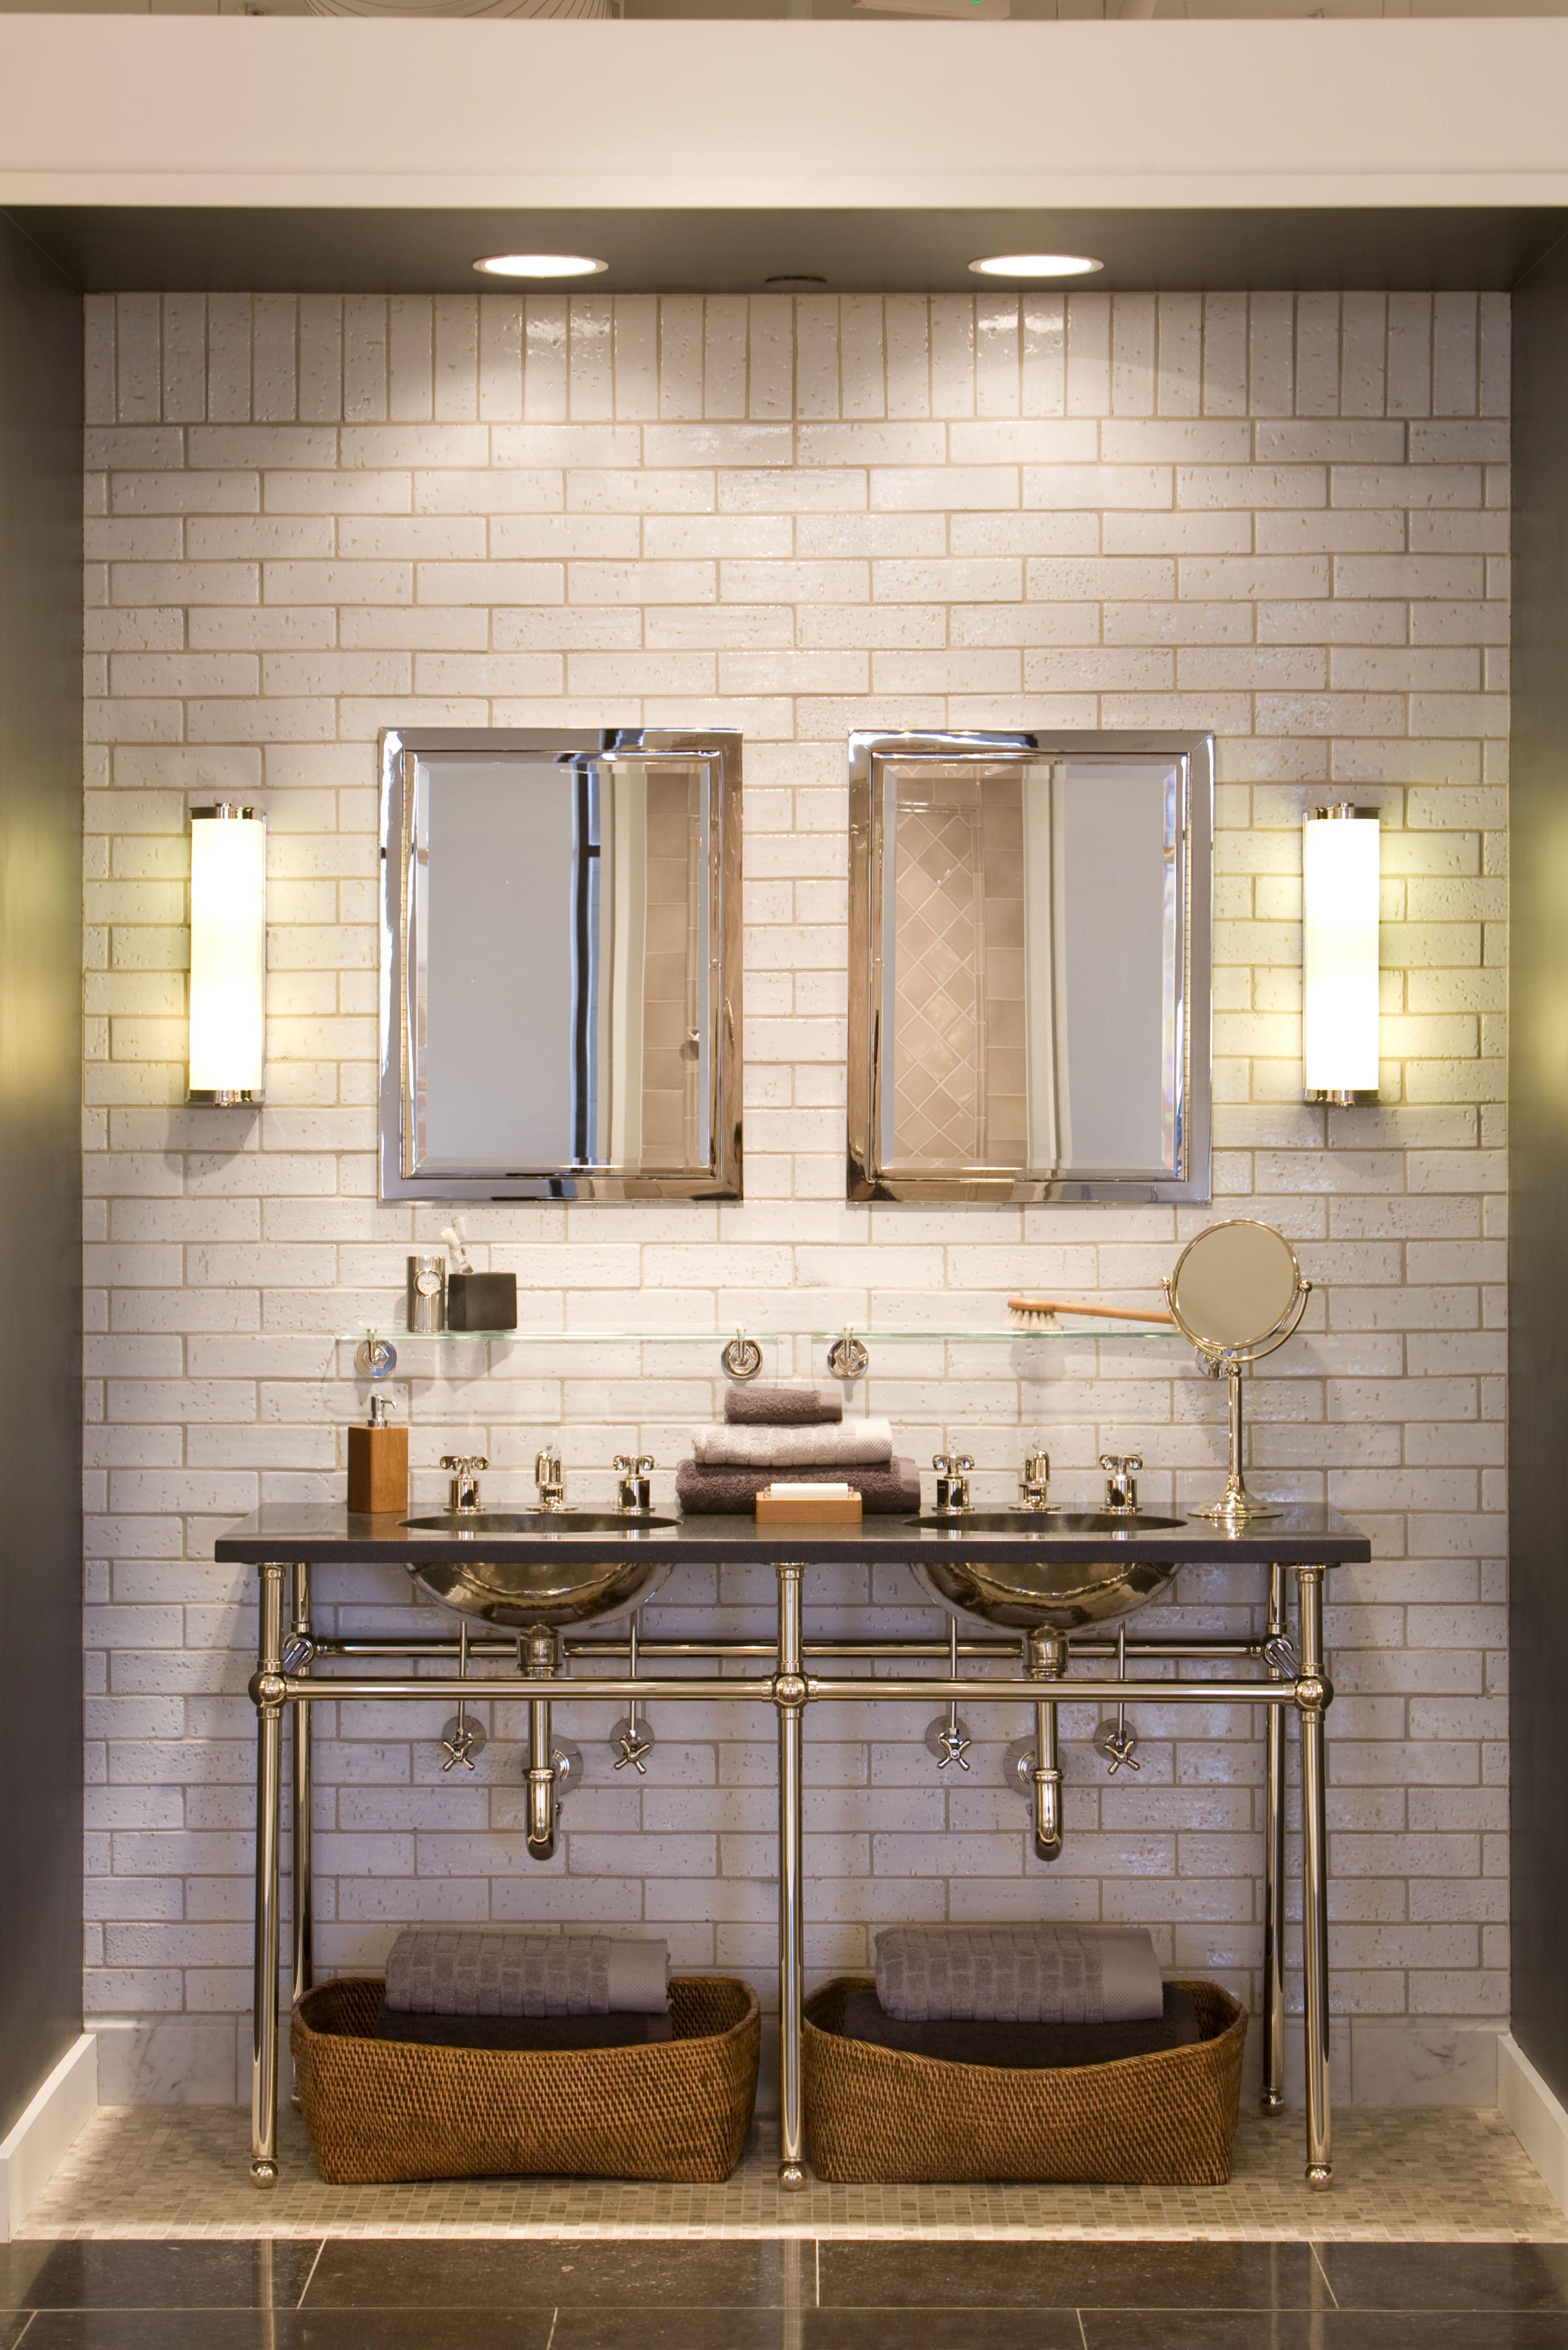 Bathroom Remodel Denver Cost Bathroom Remodel Denver Showroom - Bathroom remodel denver cost